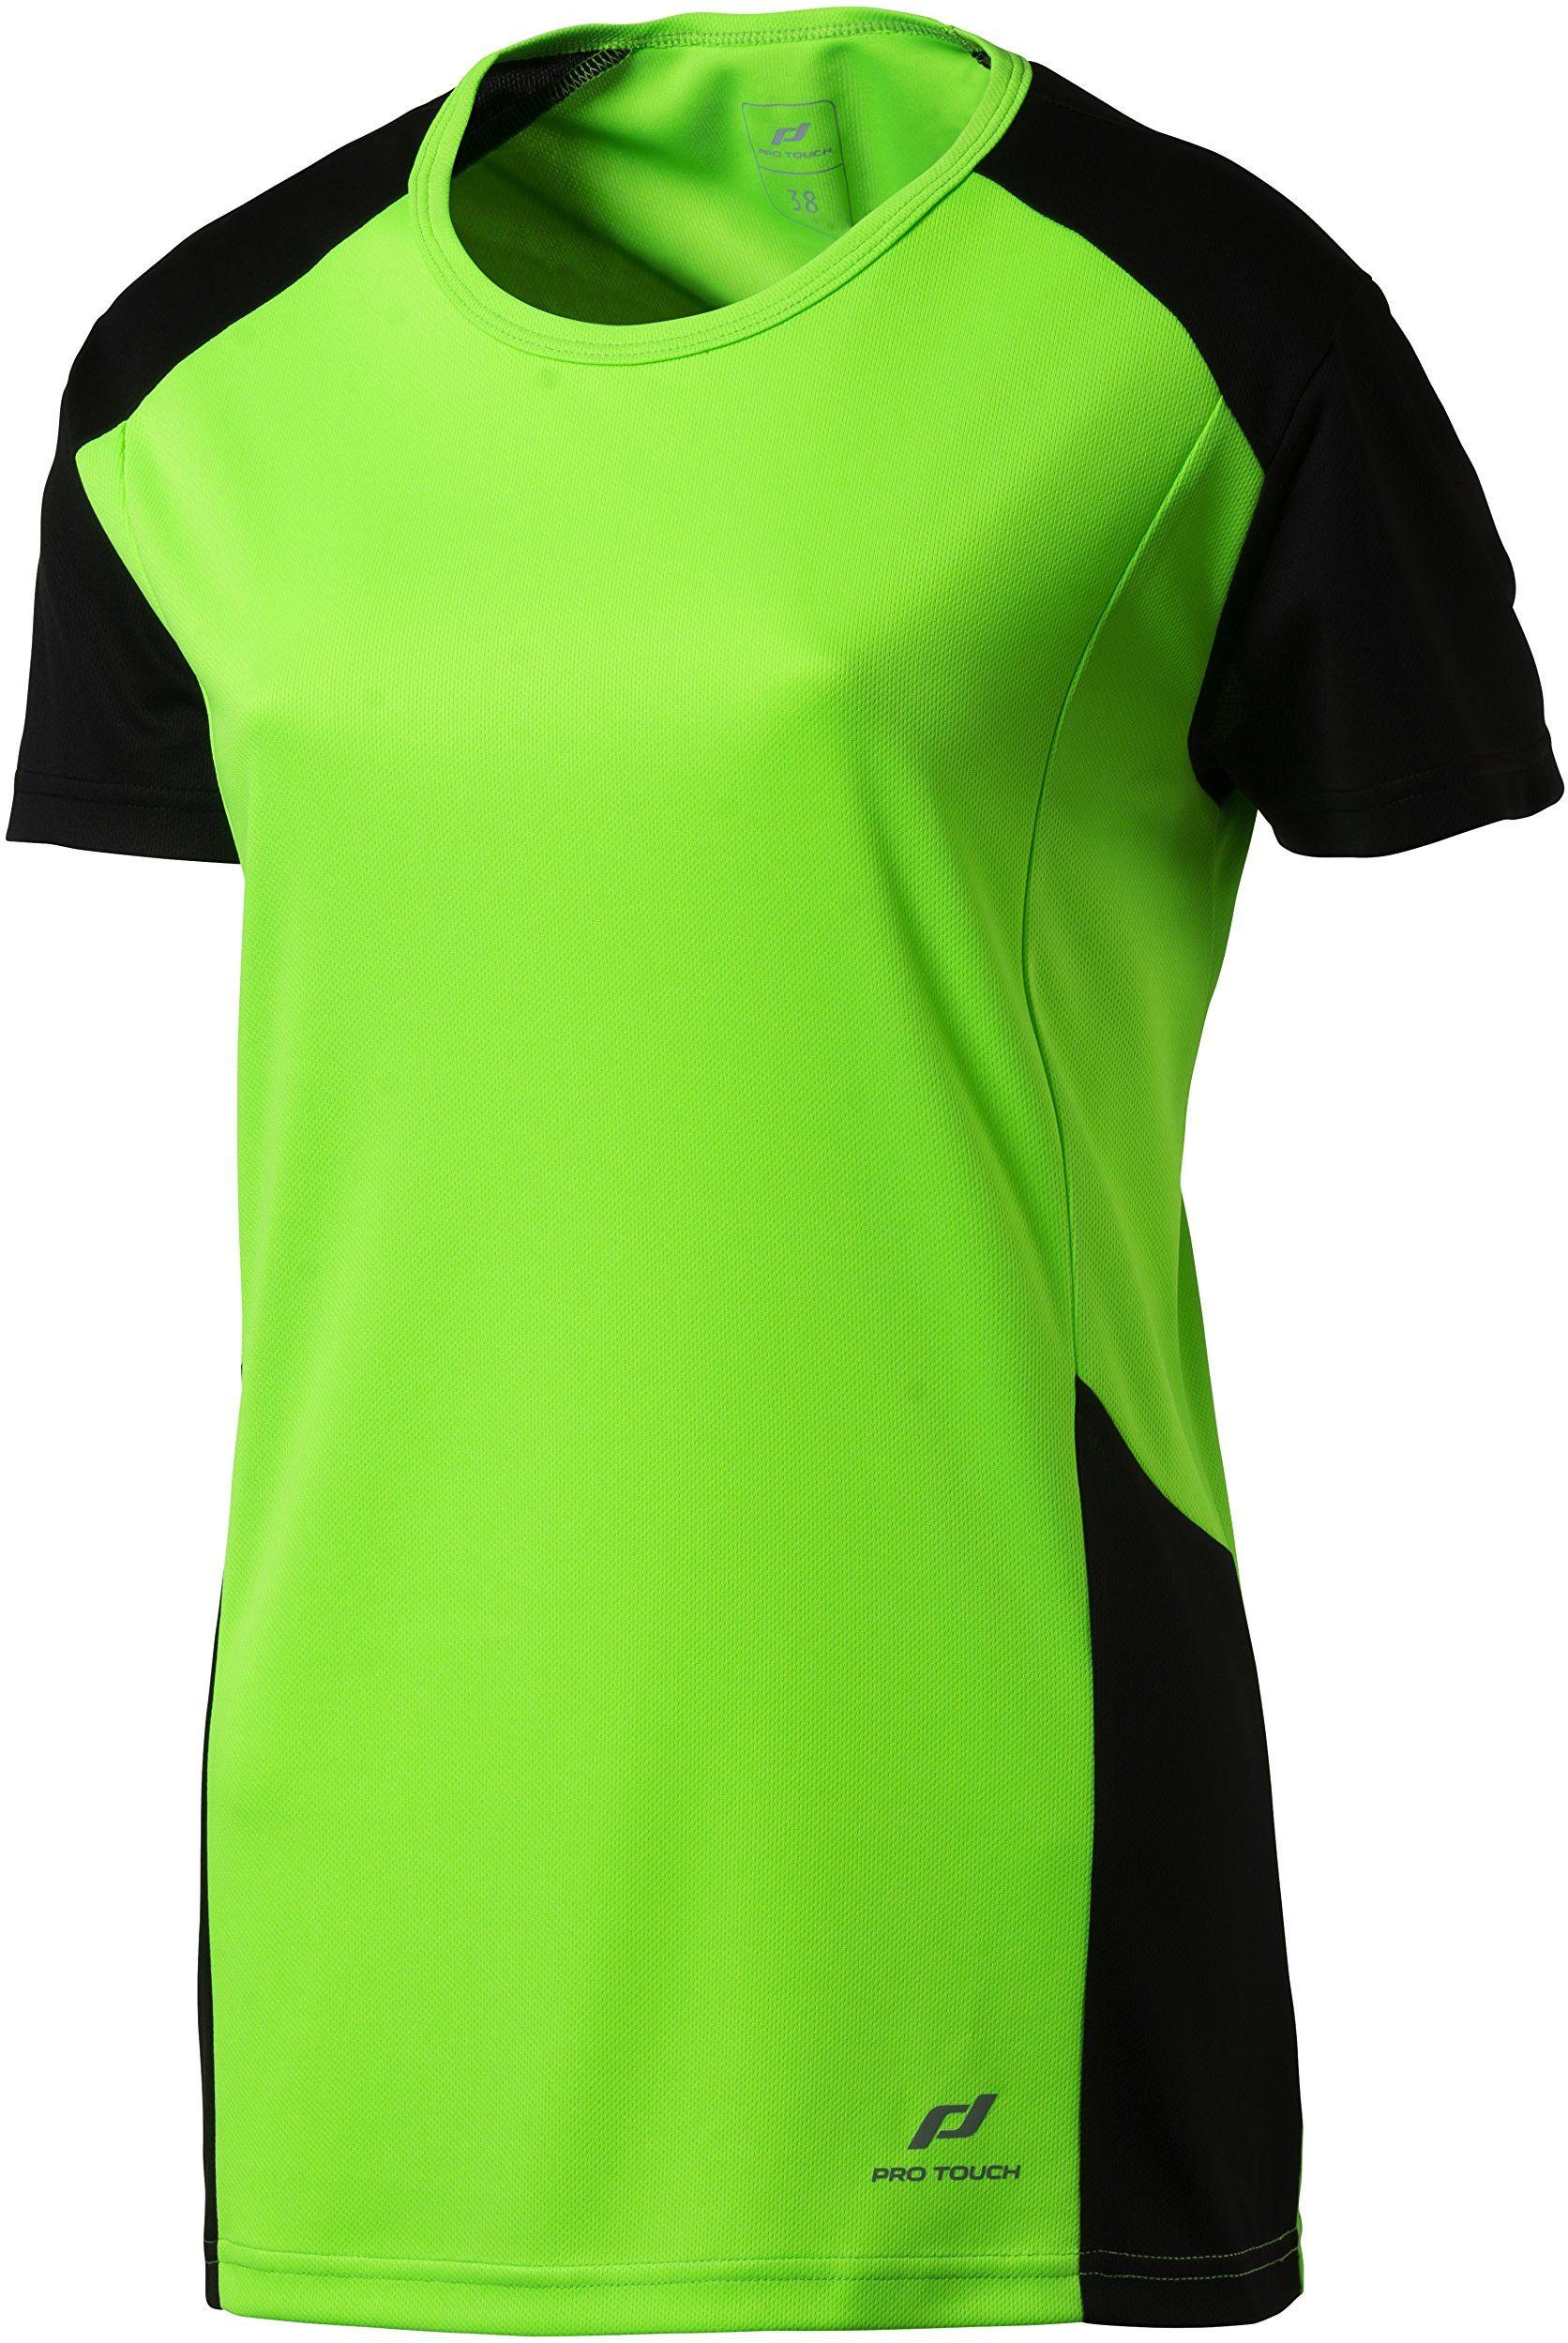 Pro Touch damska koszulka na kubek, zielona gecko/czarna, 36